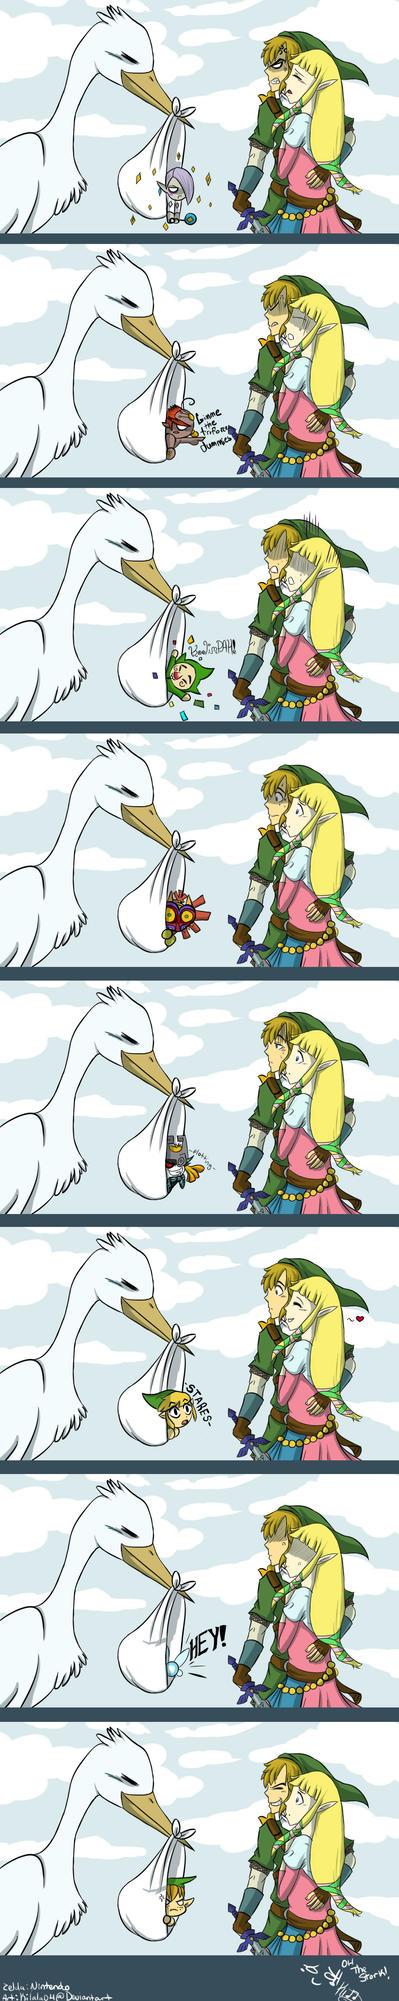 Zelda: The Stork by Kilala04